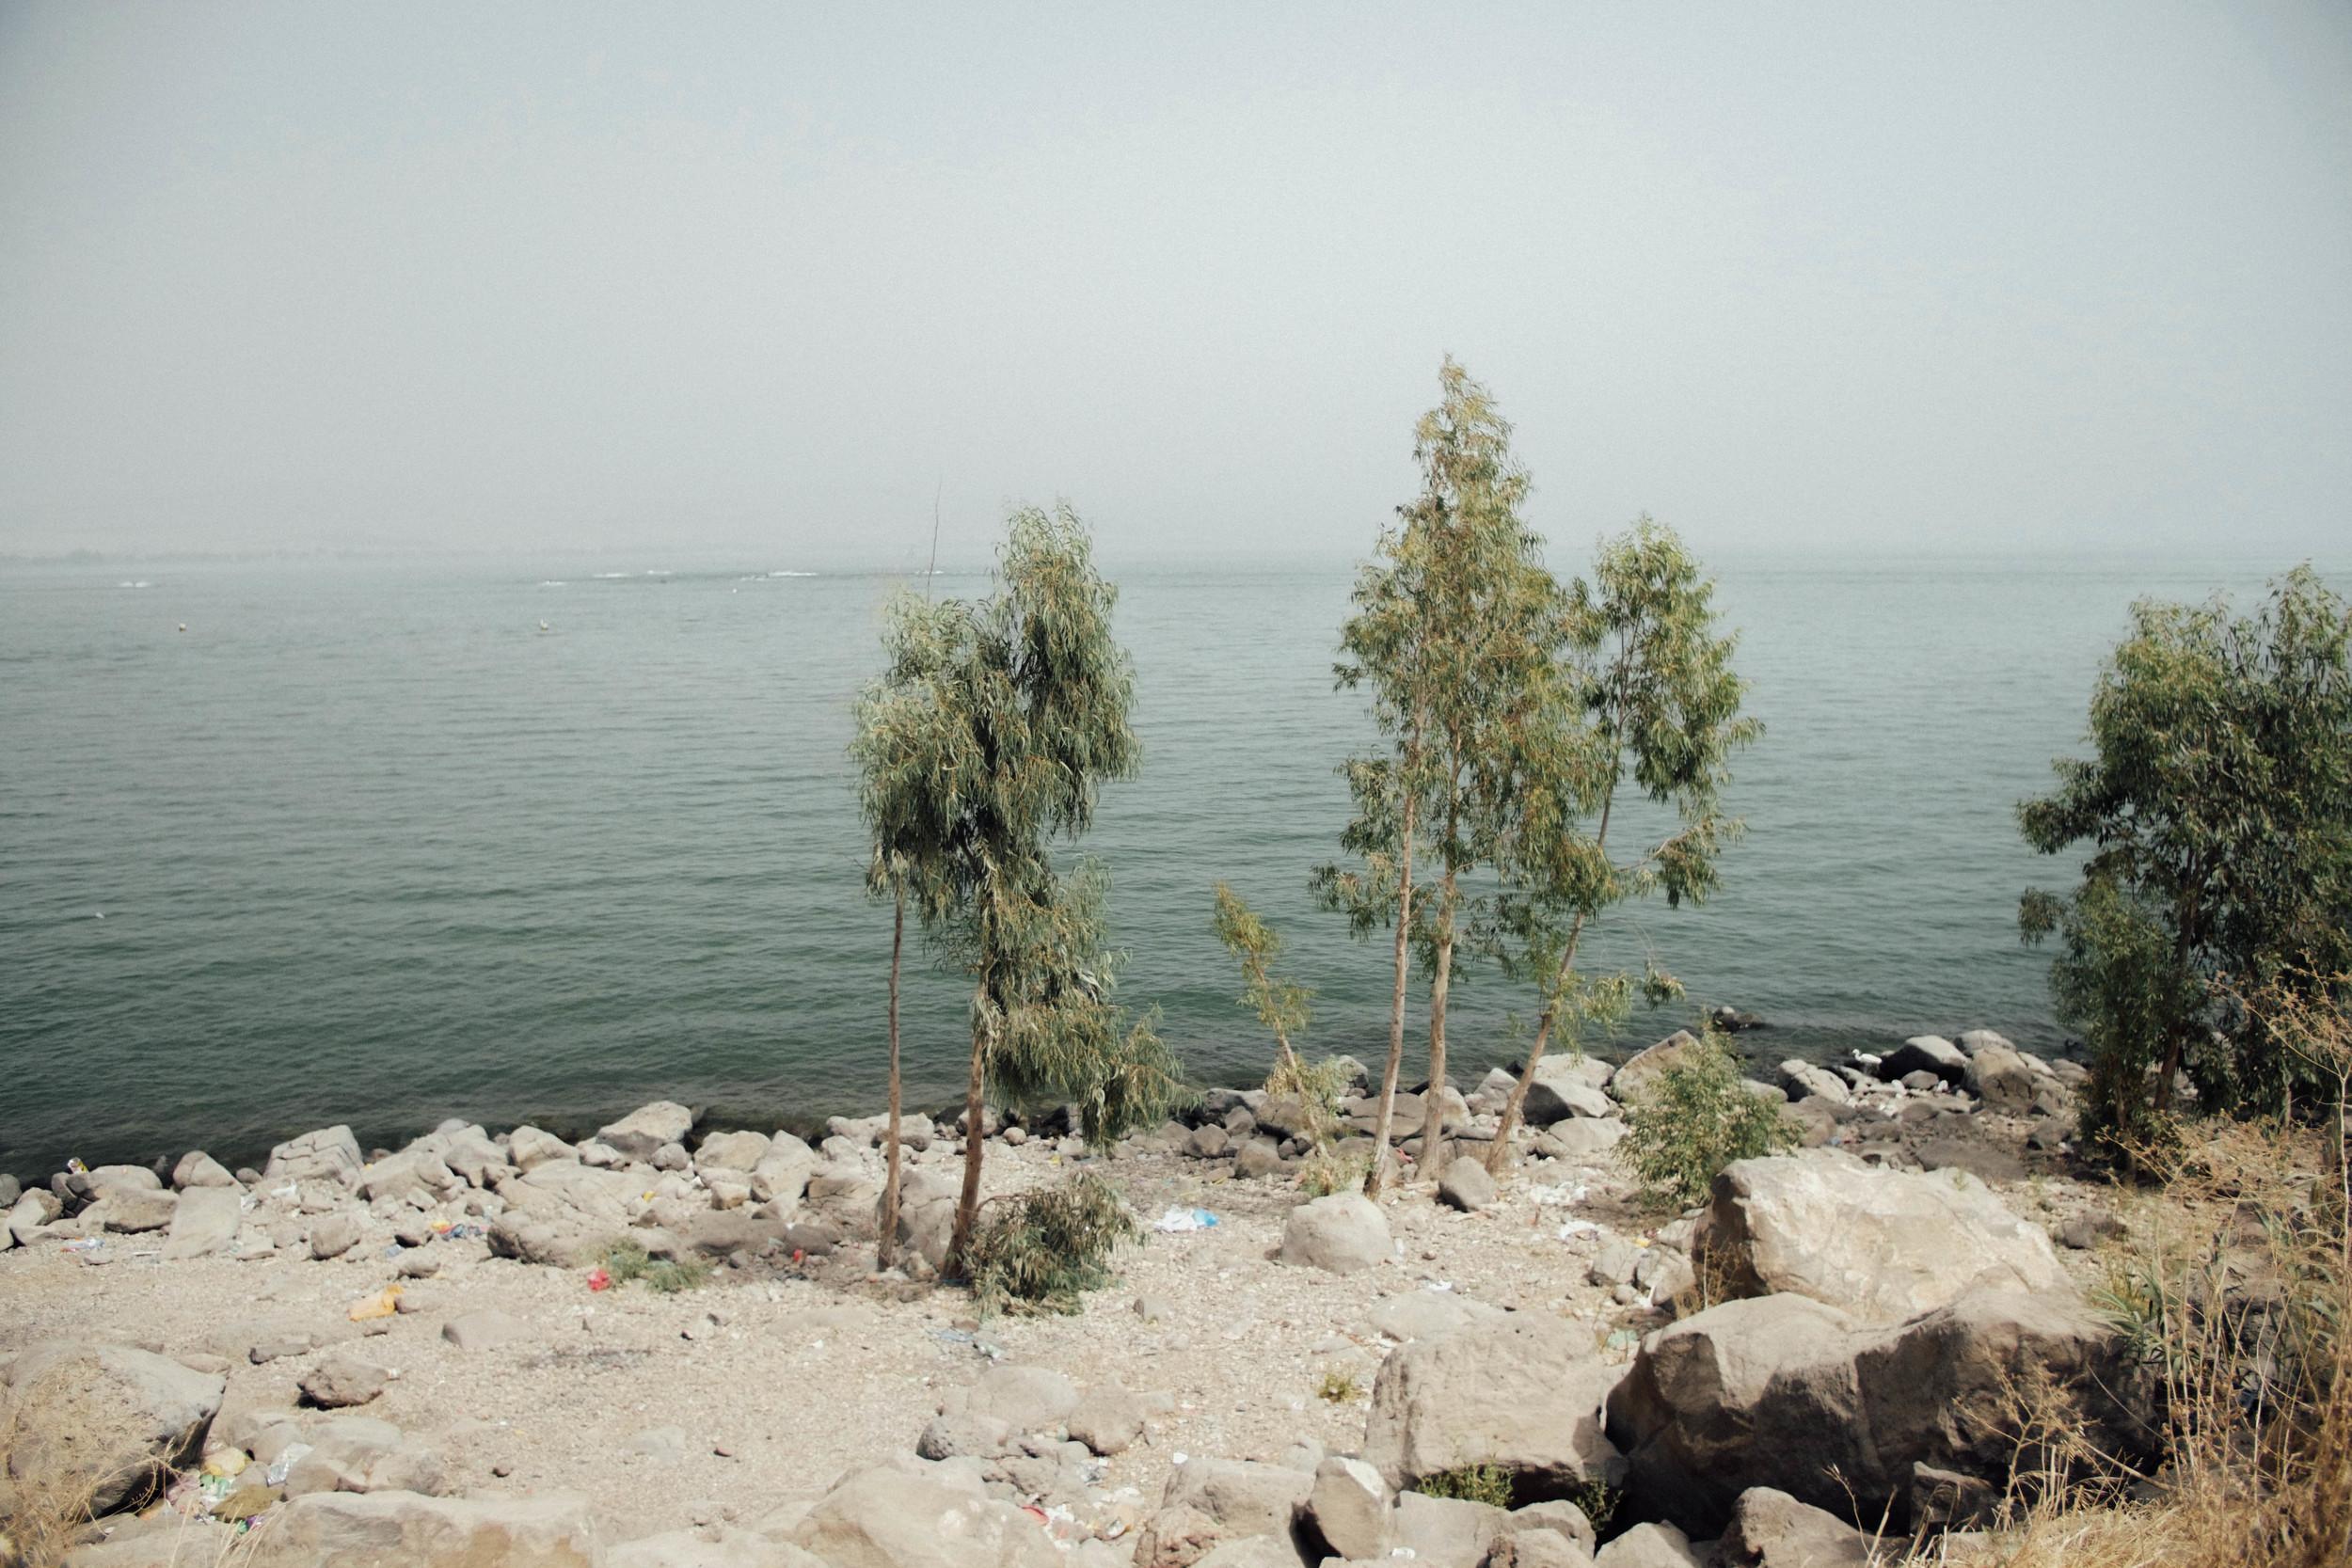 Lake Tiberias (or Sea of Galilee)